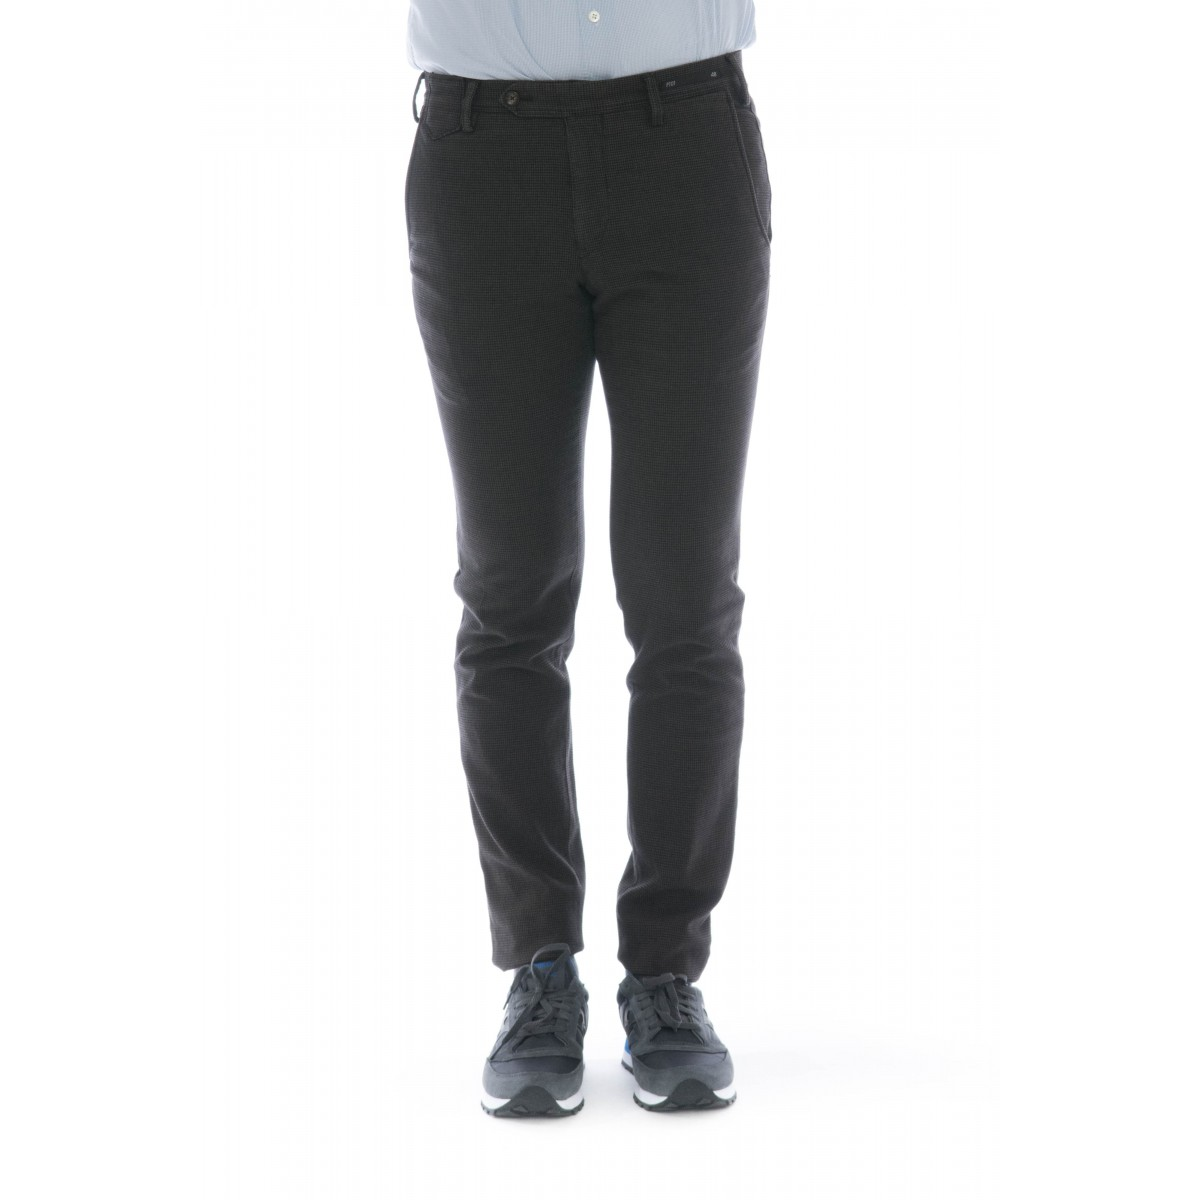 Pantalone uomo - Codl sd29 cotone strech super slim stampa